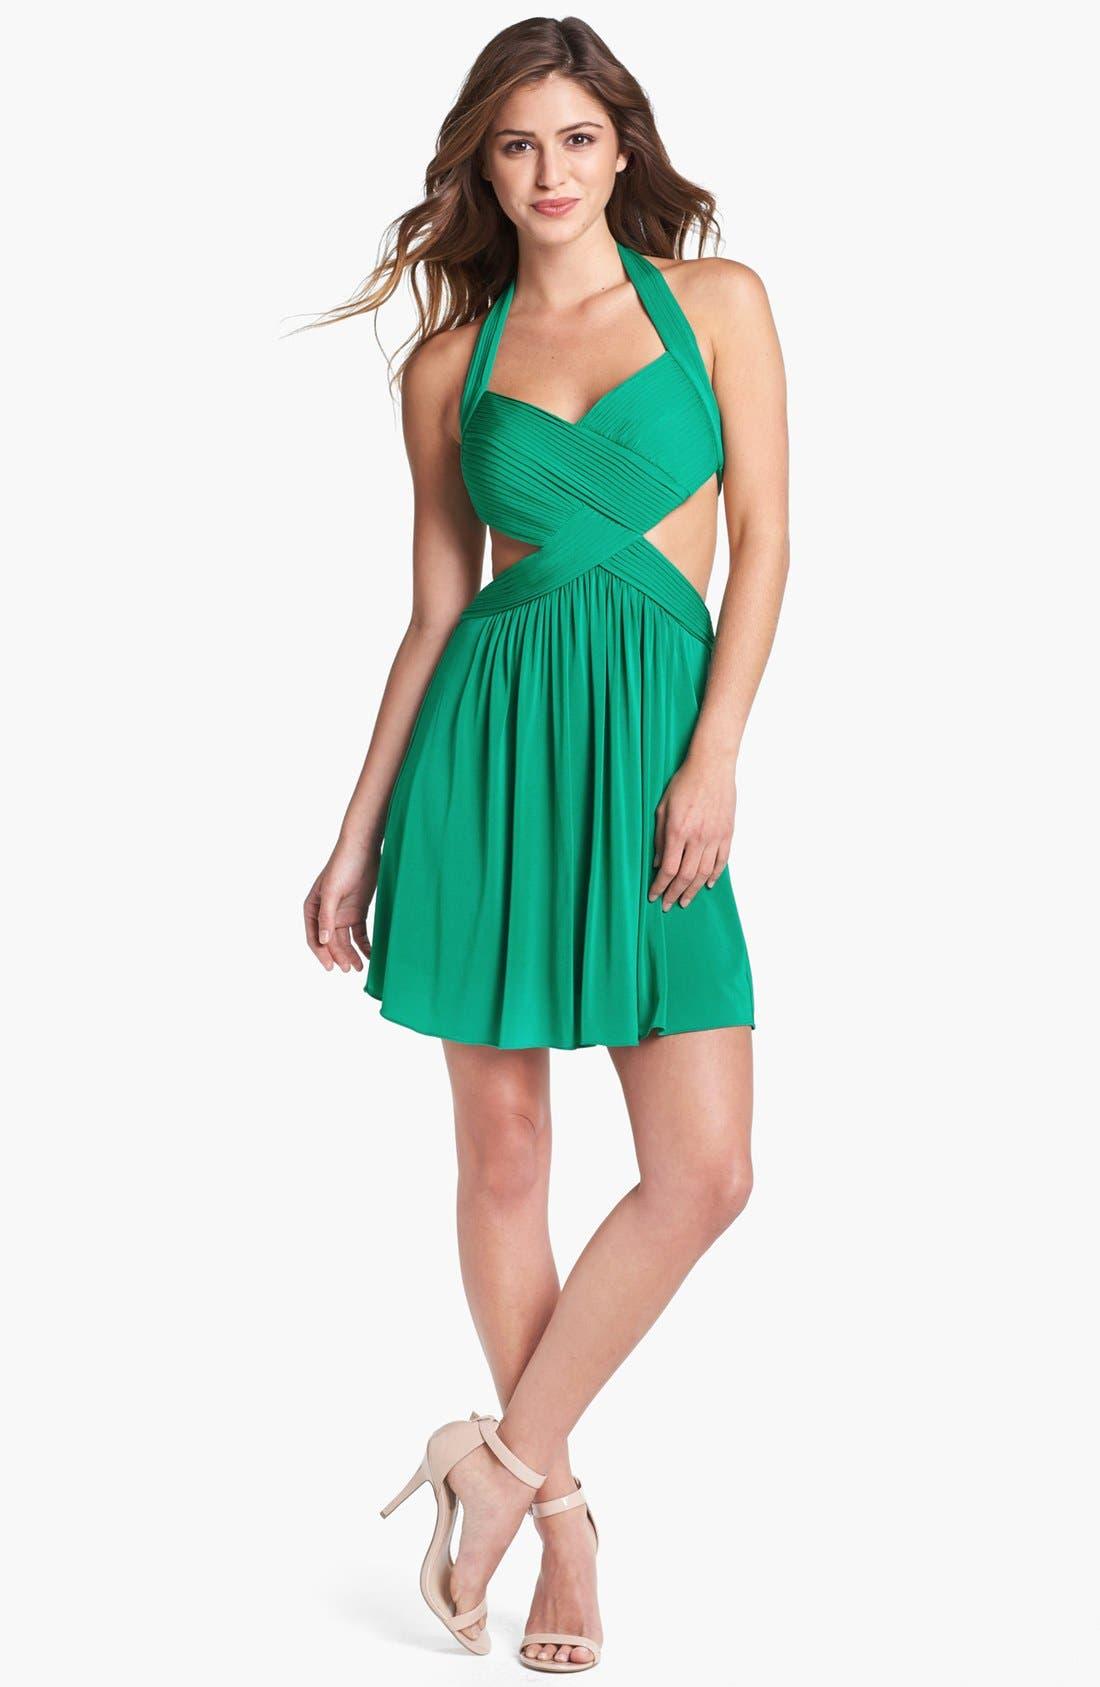 Alternate Image 1 Selected - BCBGMAXAZRIA 'Shea' Cutout Halter Fit & Flare Dress